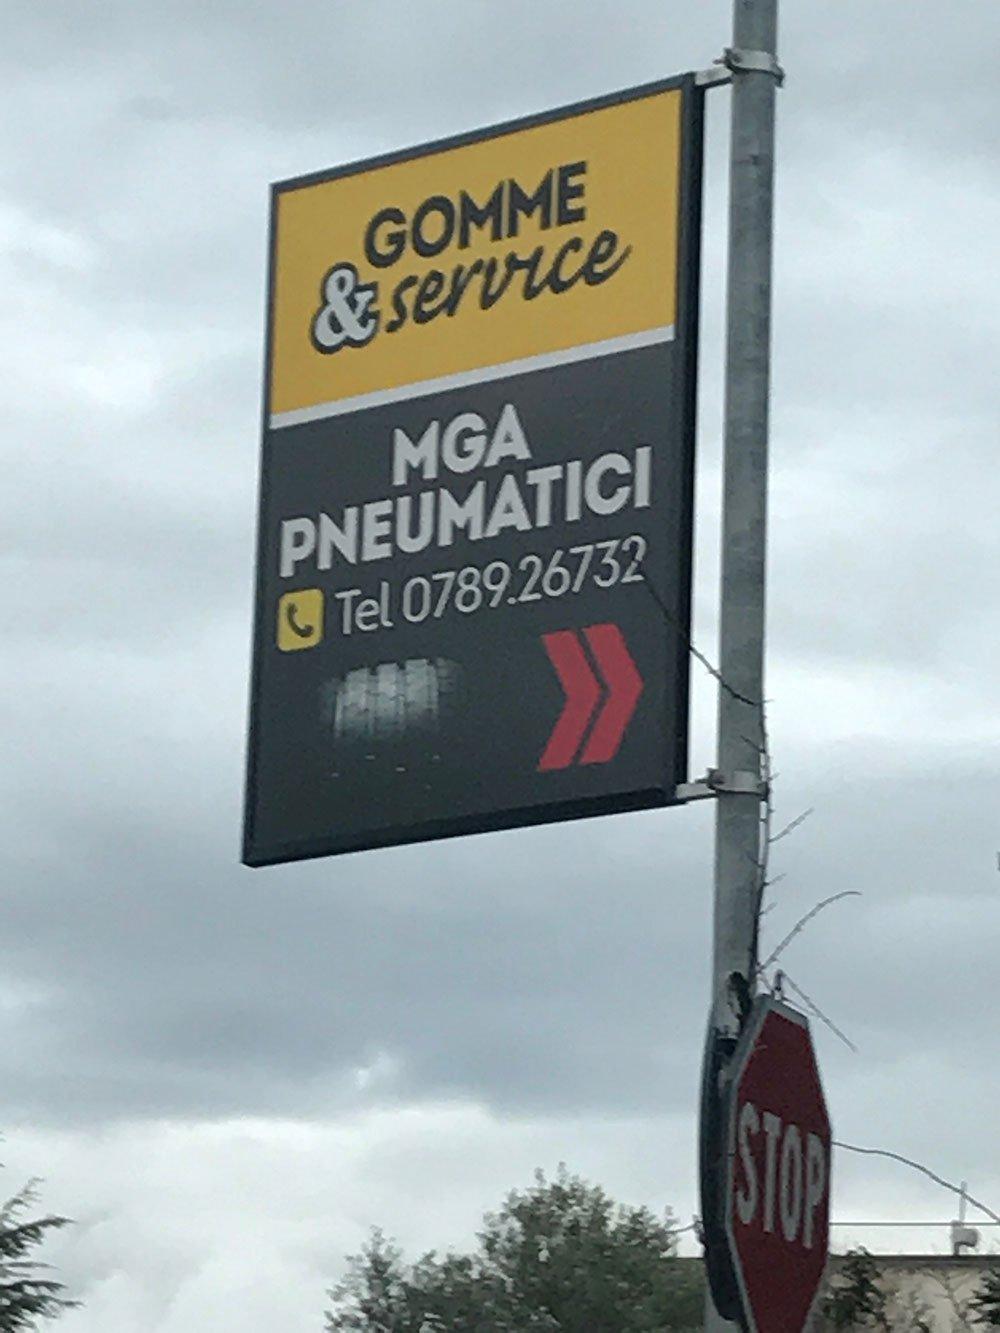 un cartello con scritto Gomme & Service MGA Pneumatici